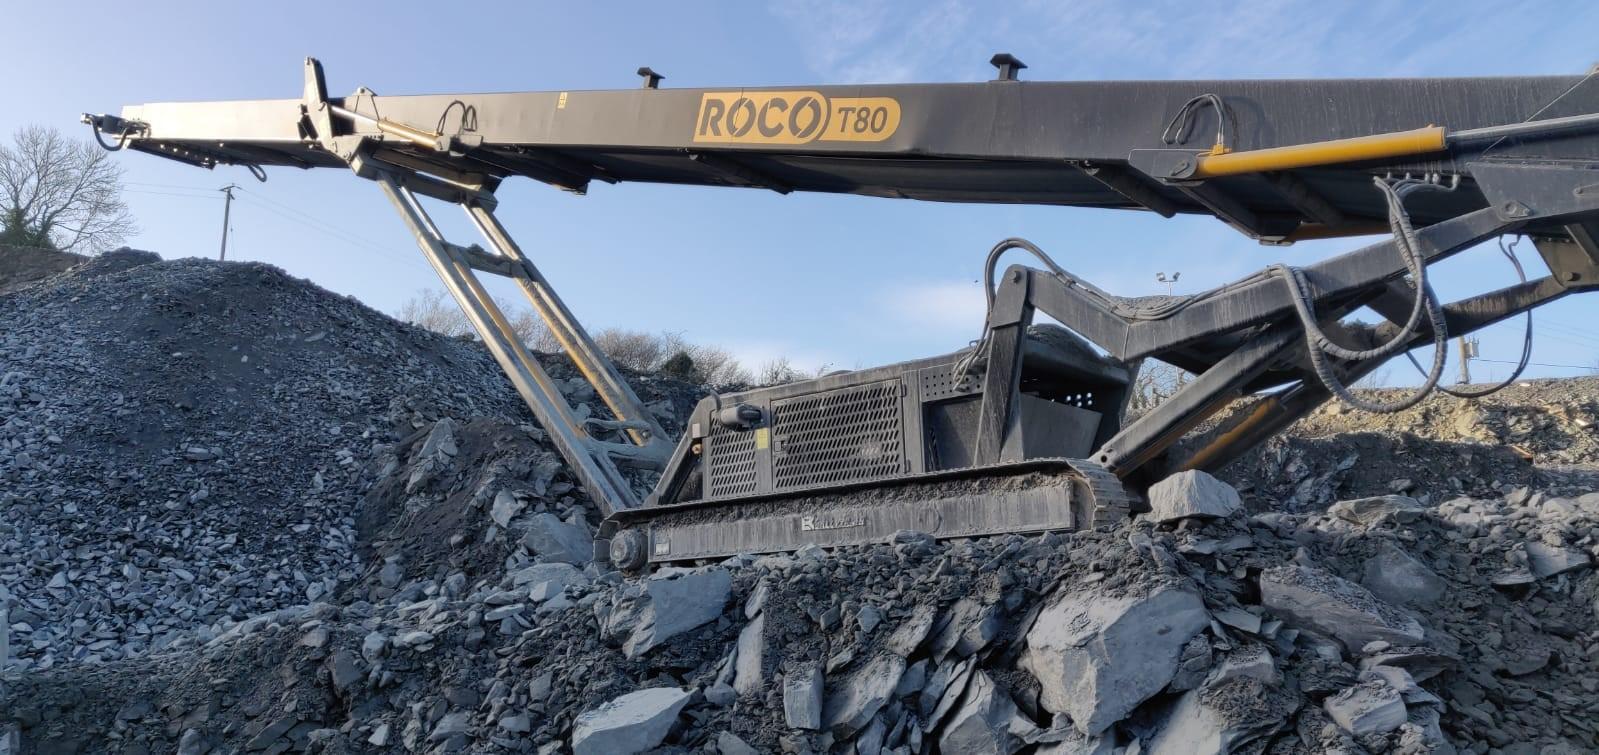 ROCO T80 Stacker Working